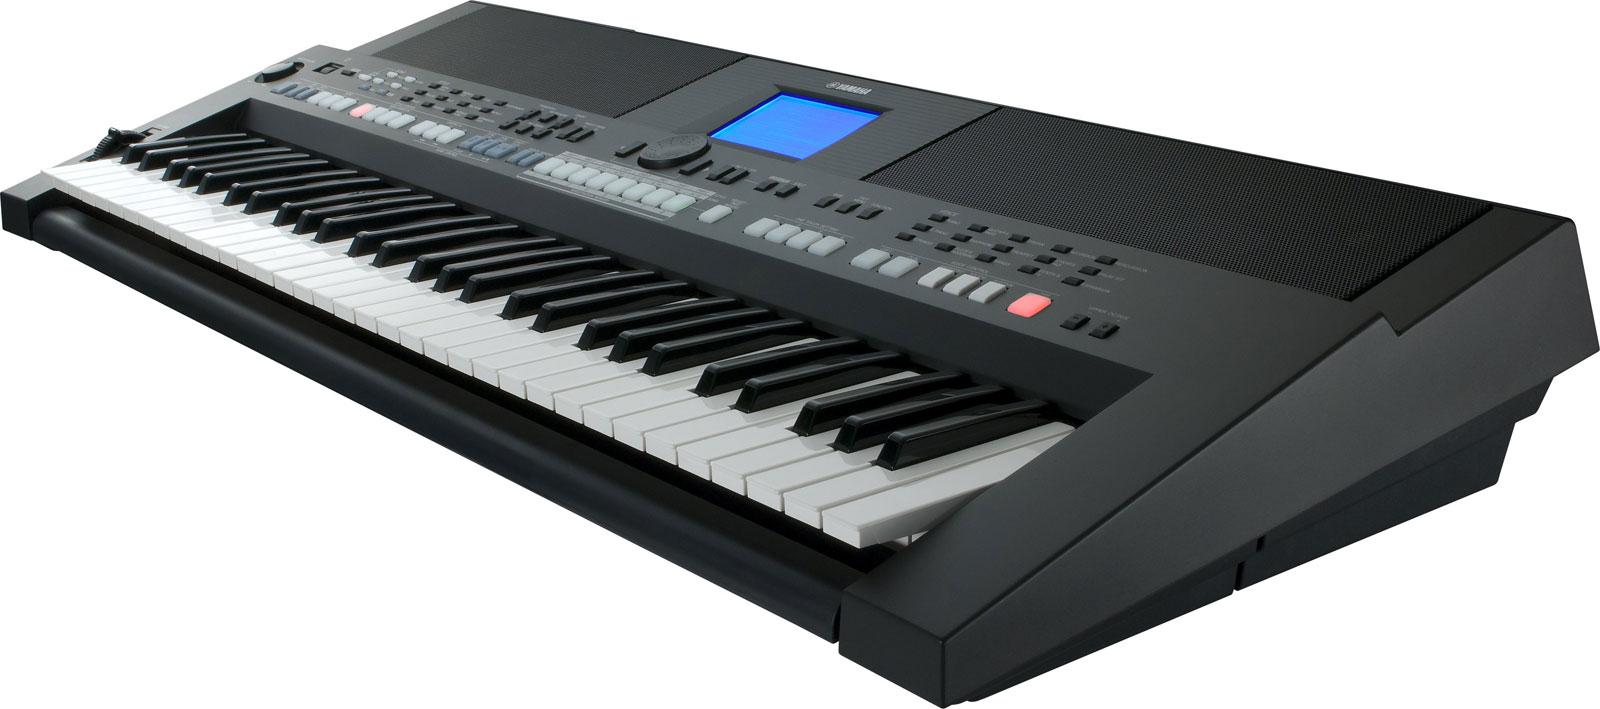 Beginner Keyboards Yamaha